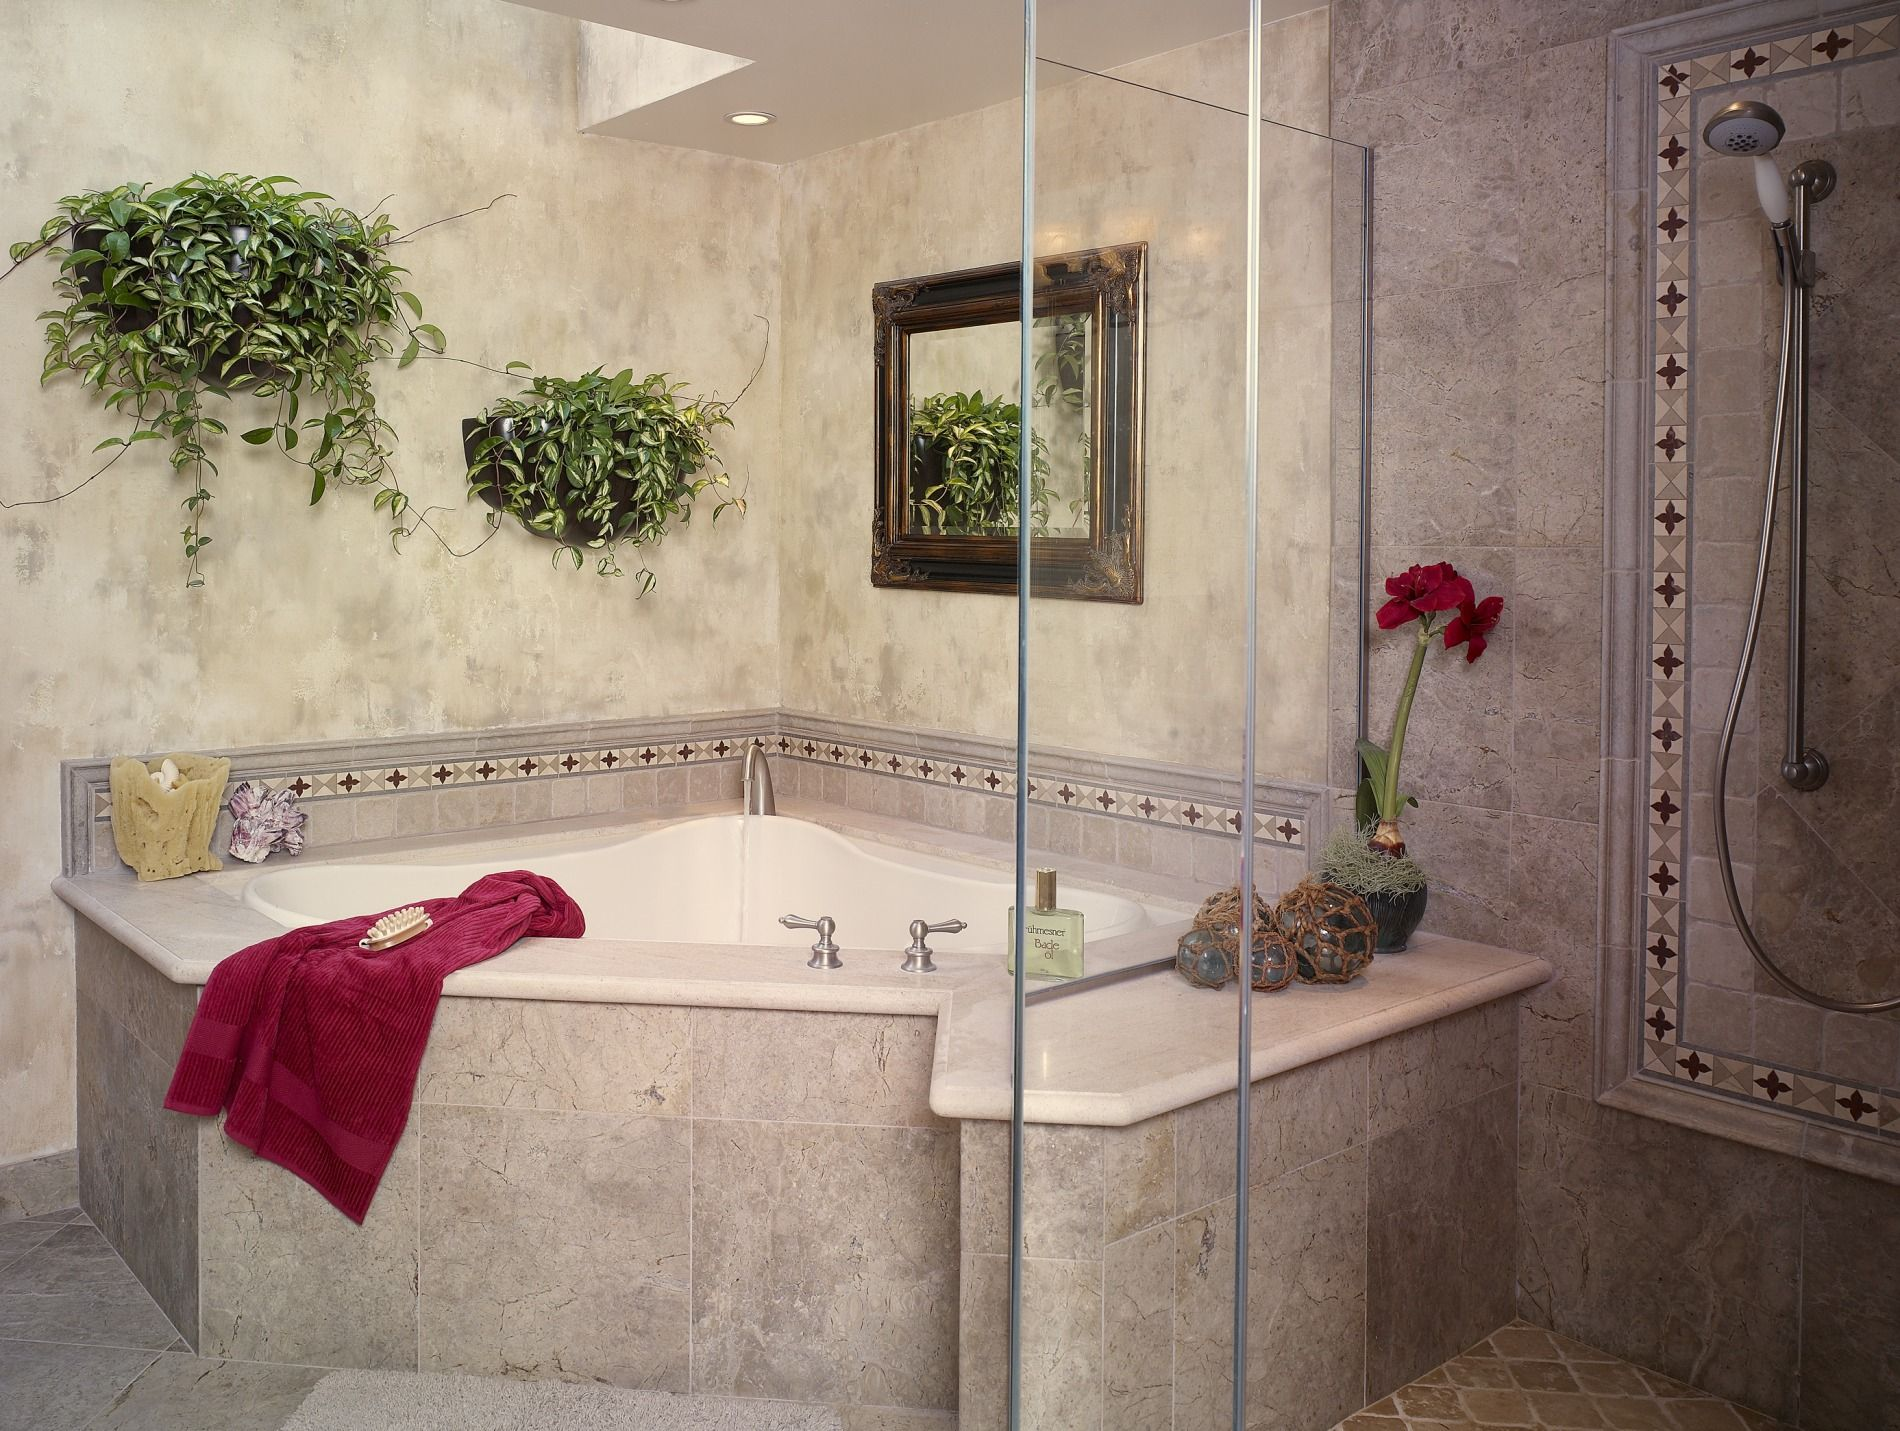 Corner Tub and Shower | Hot Tubs & Jacuzzis | Pinterest | Corner tub ...